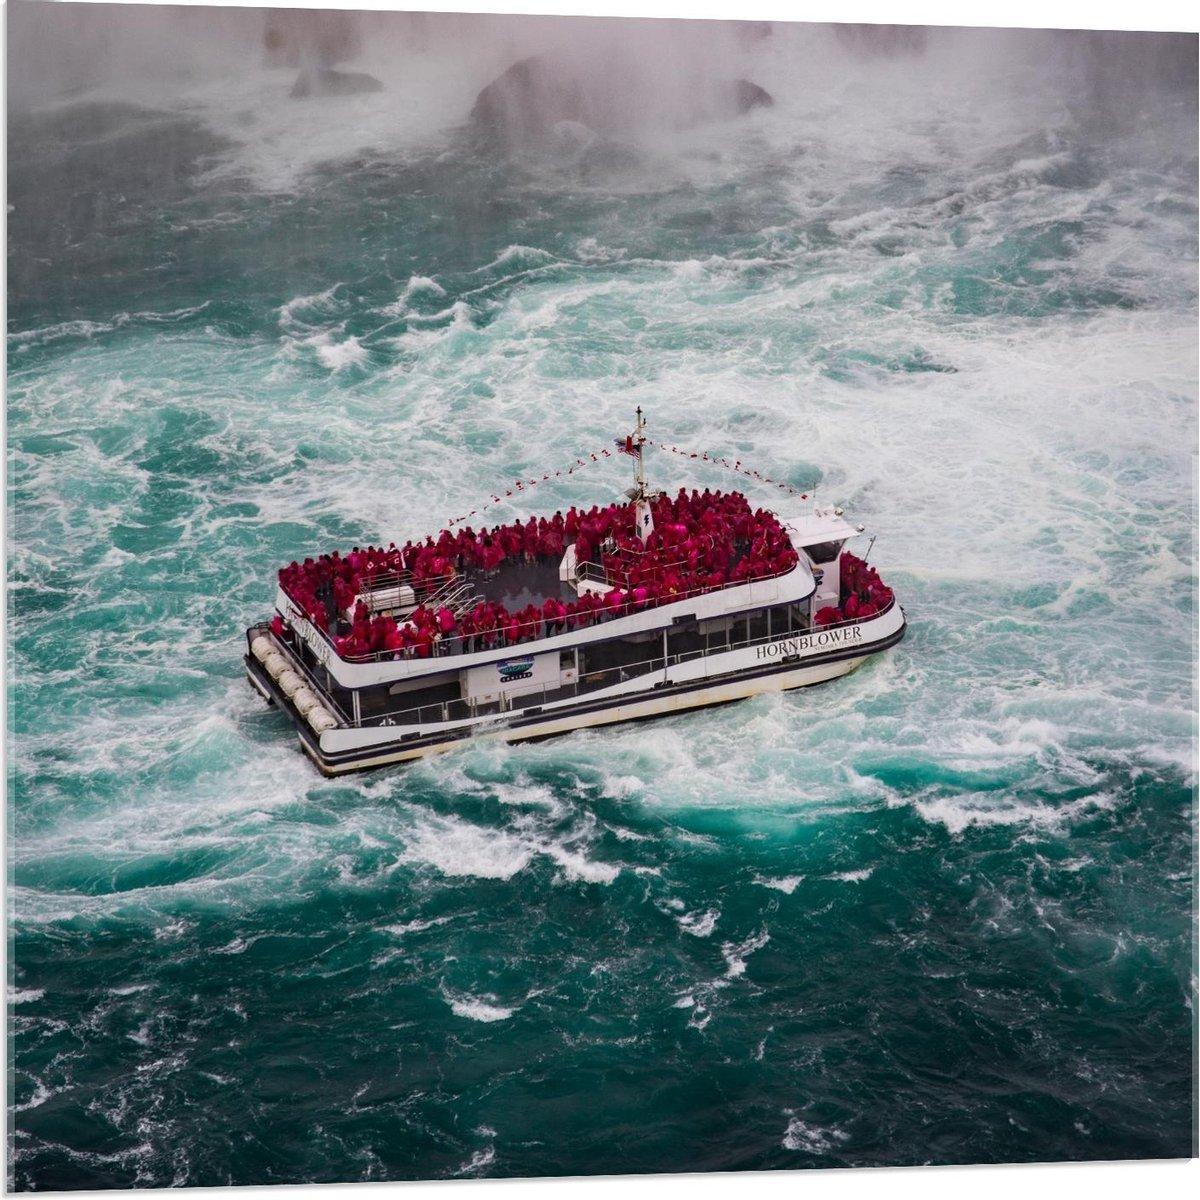 Plexiglas - Personenboot op Zee - 80x80cm Foto op Plexiglas (Met Ophangsysteem)